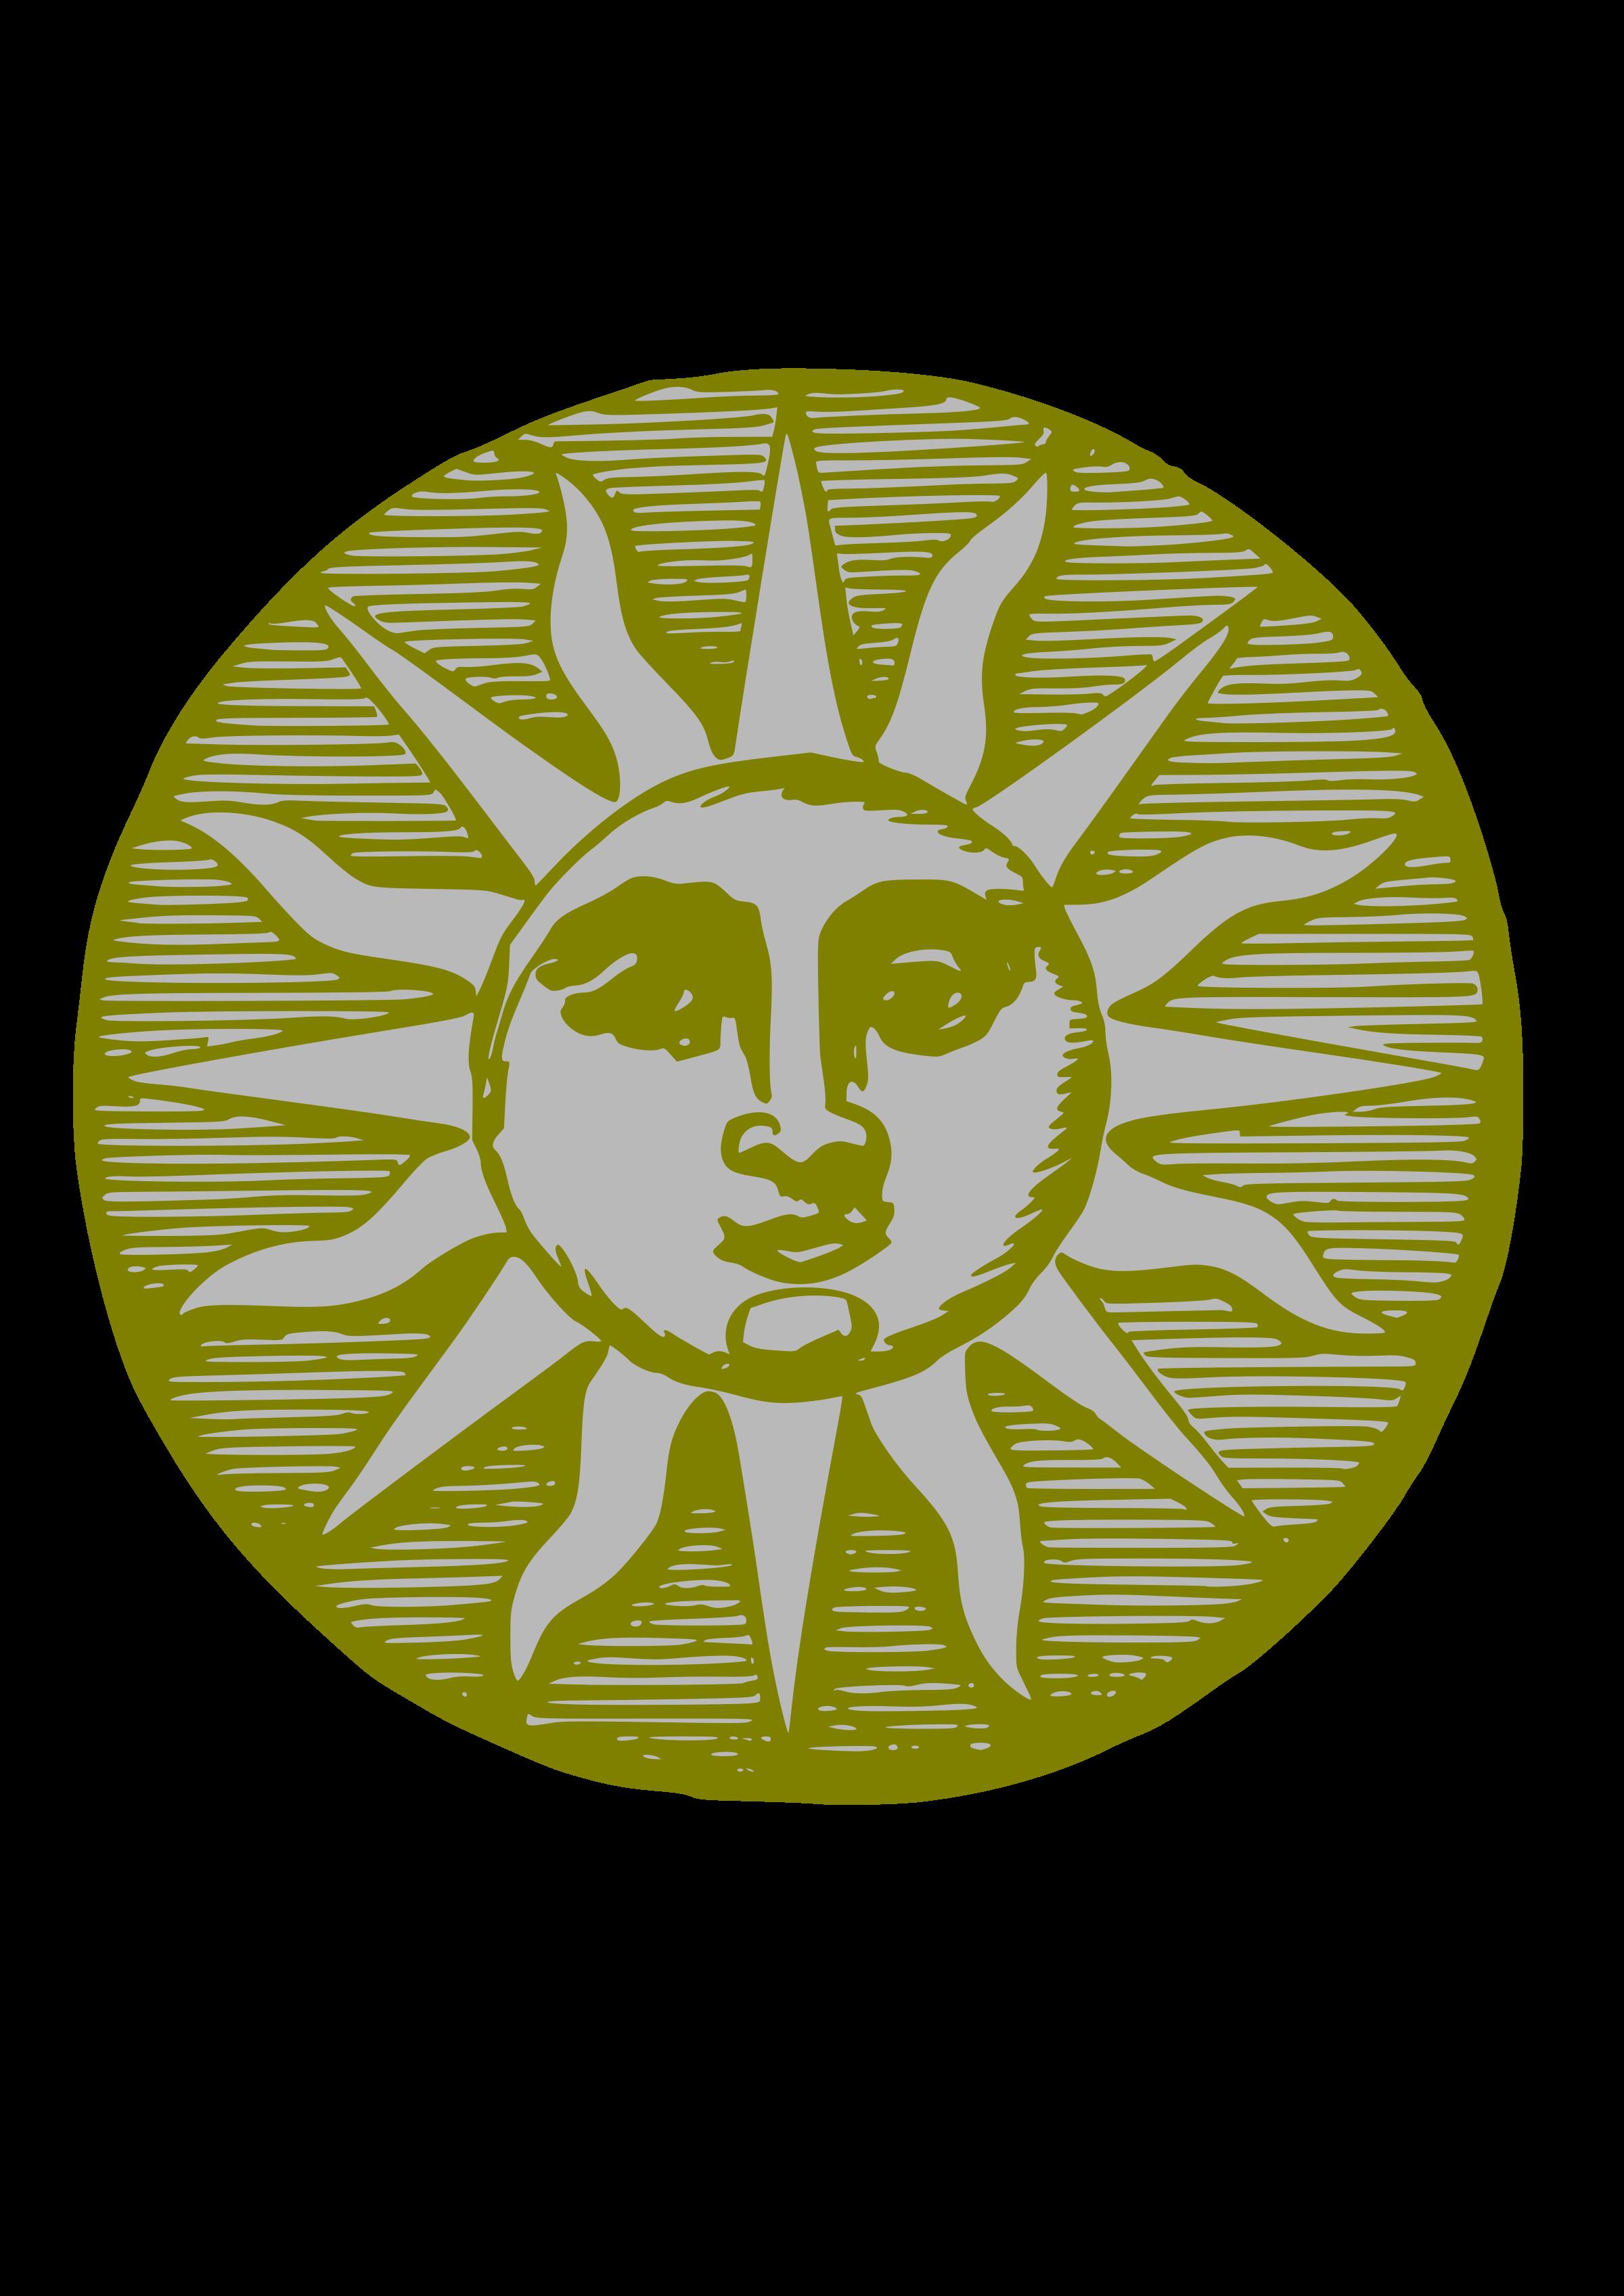 Free Vintage Sun Cliparts, Download Free Clip Art, Free Clip.